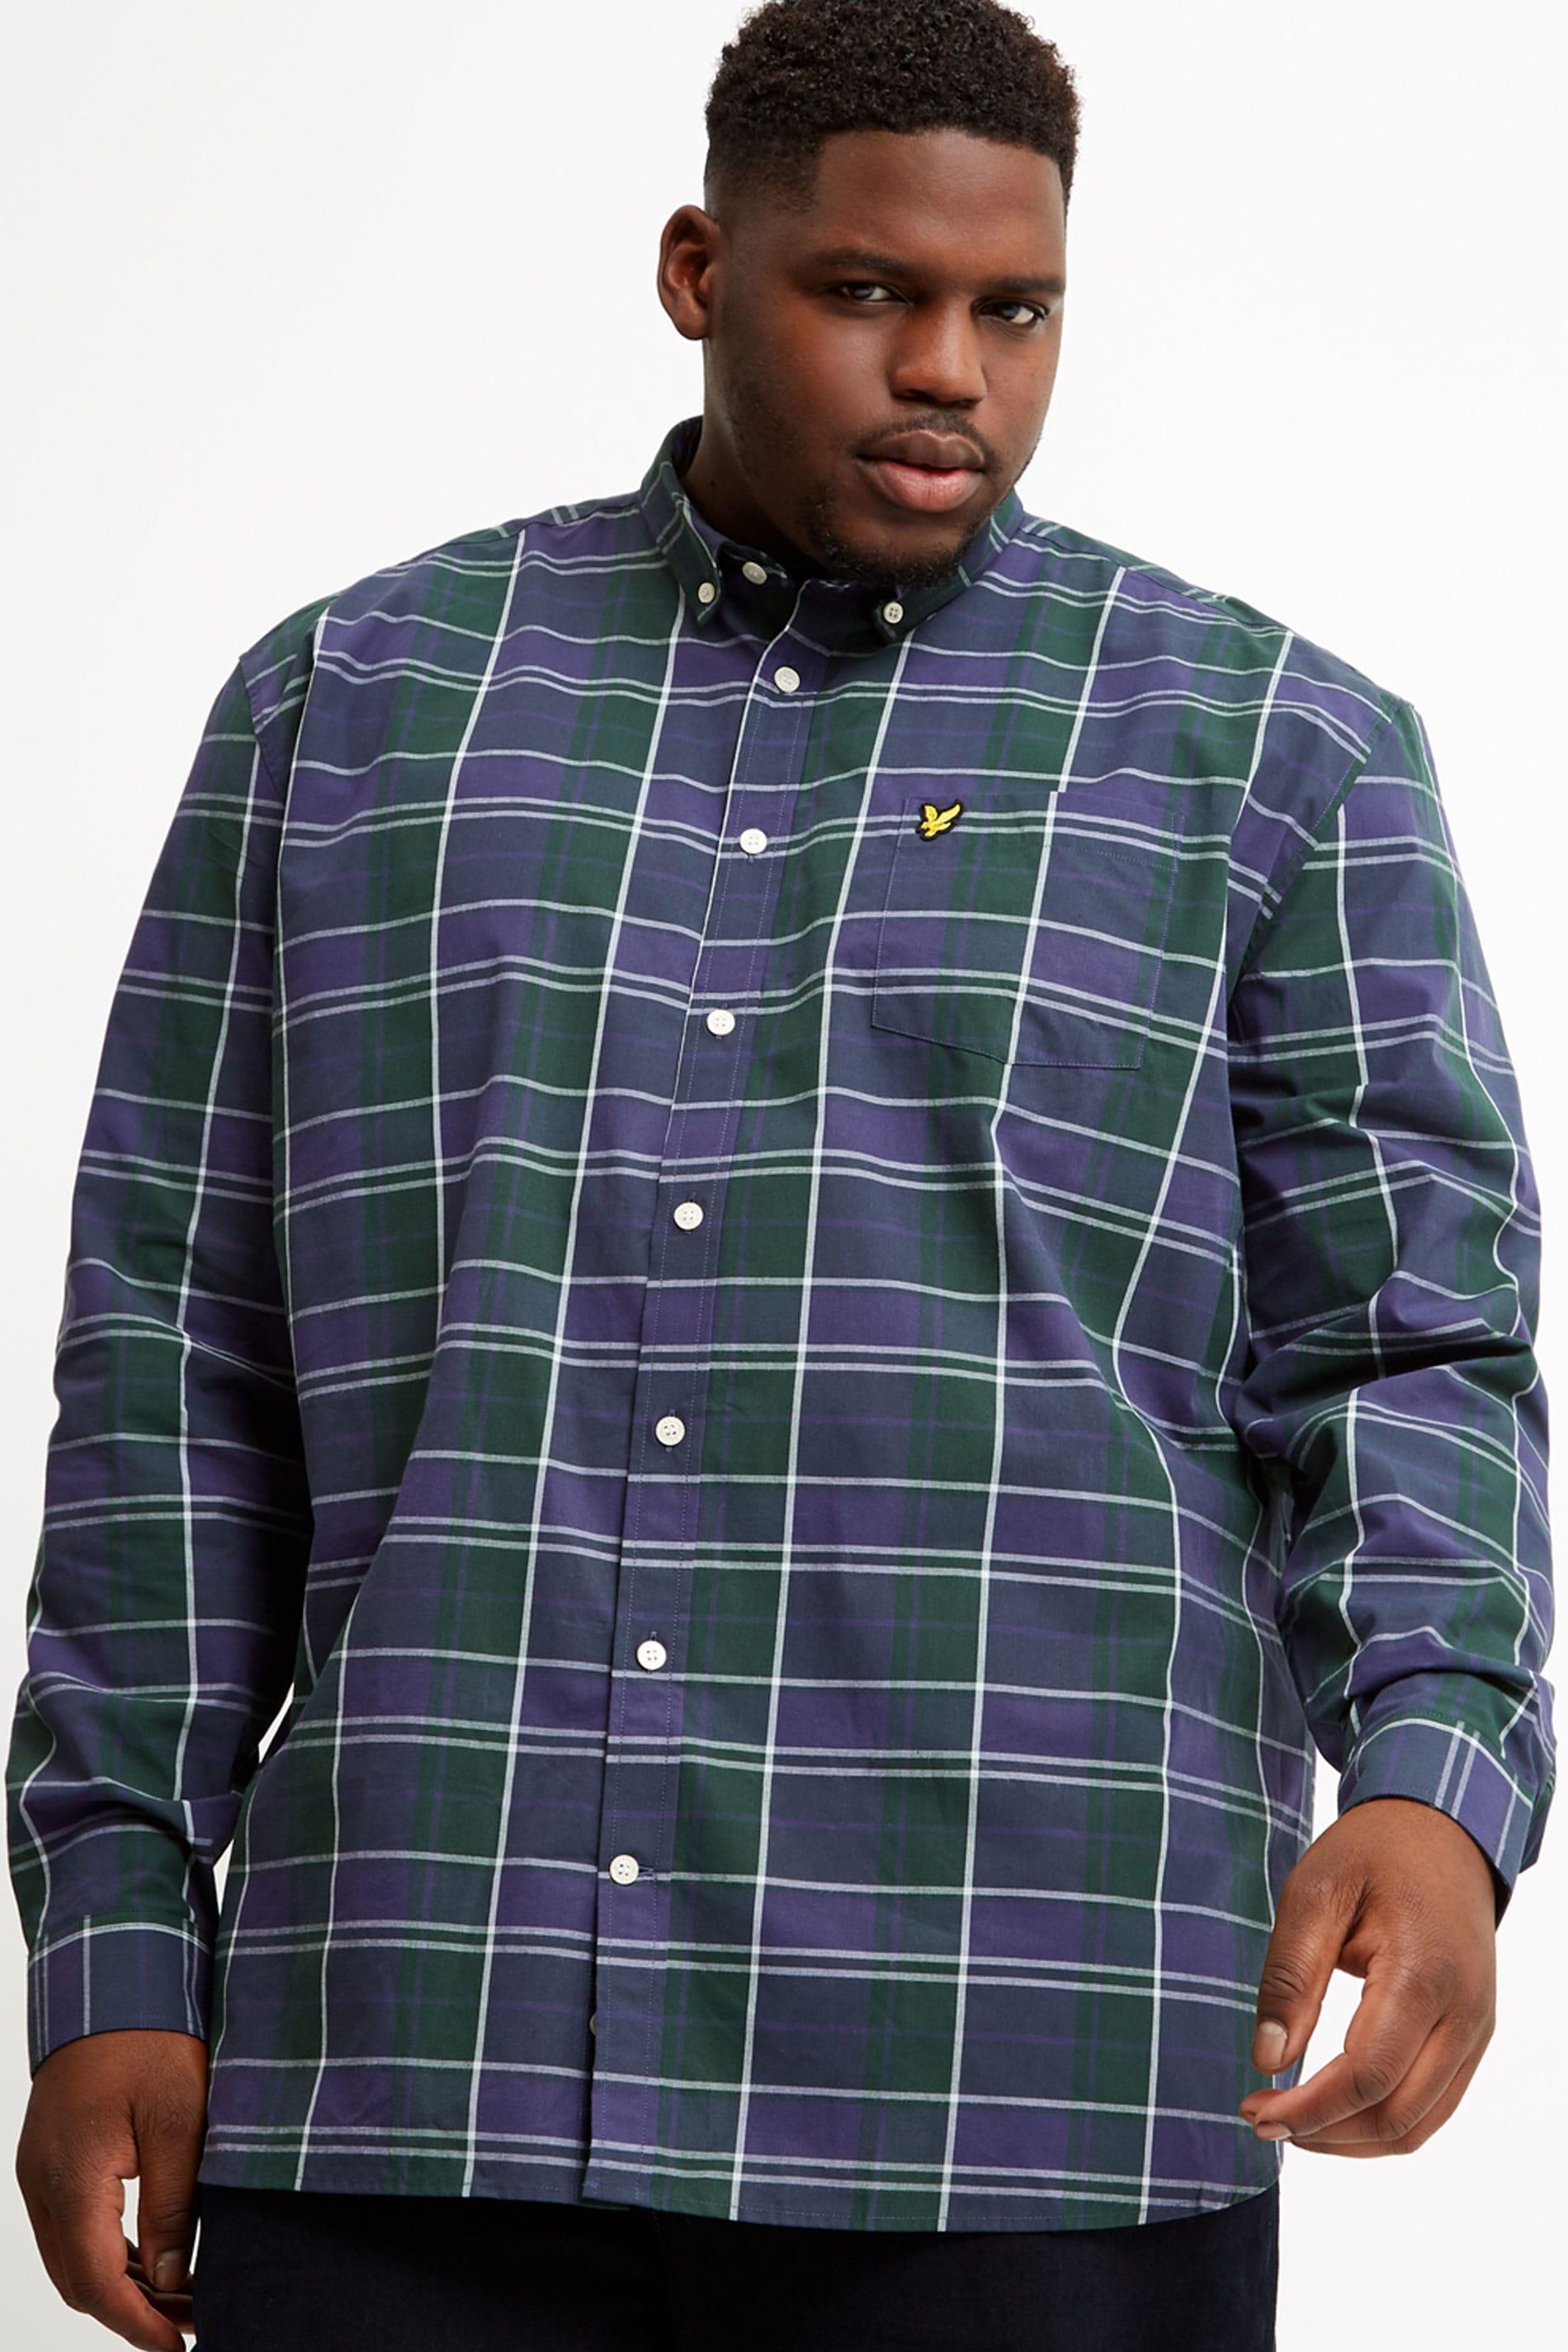 LYLE & SCOTT Navy & Green Check Shirt